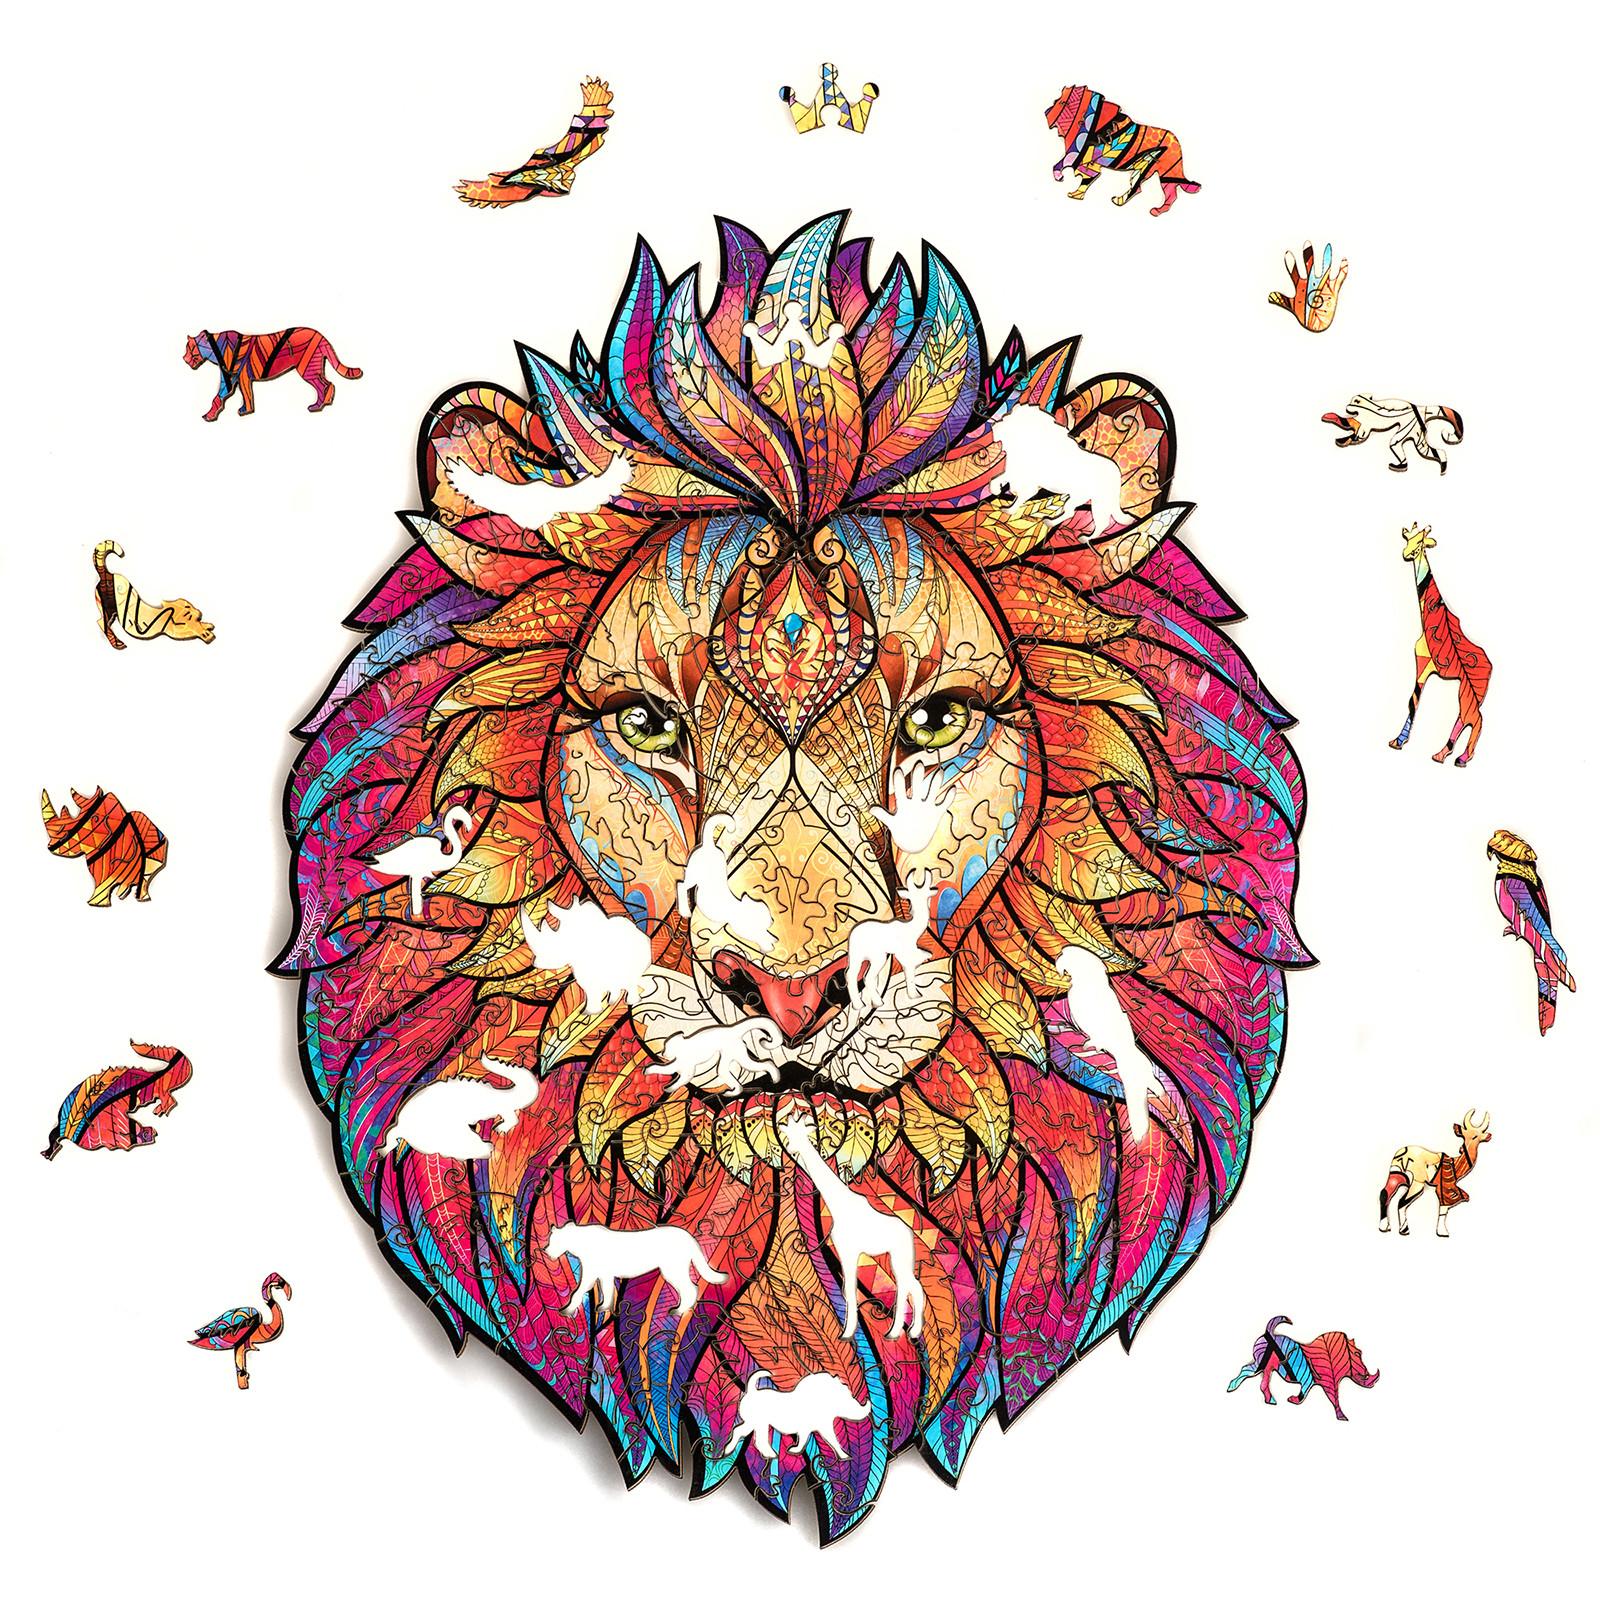 Unidragon деревянный пазл «Таинственный Лев» S (24х19) А5